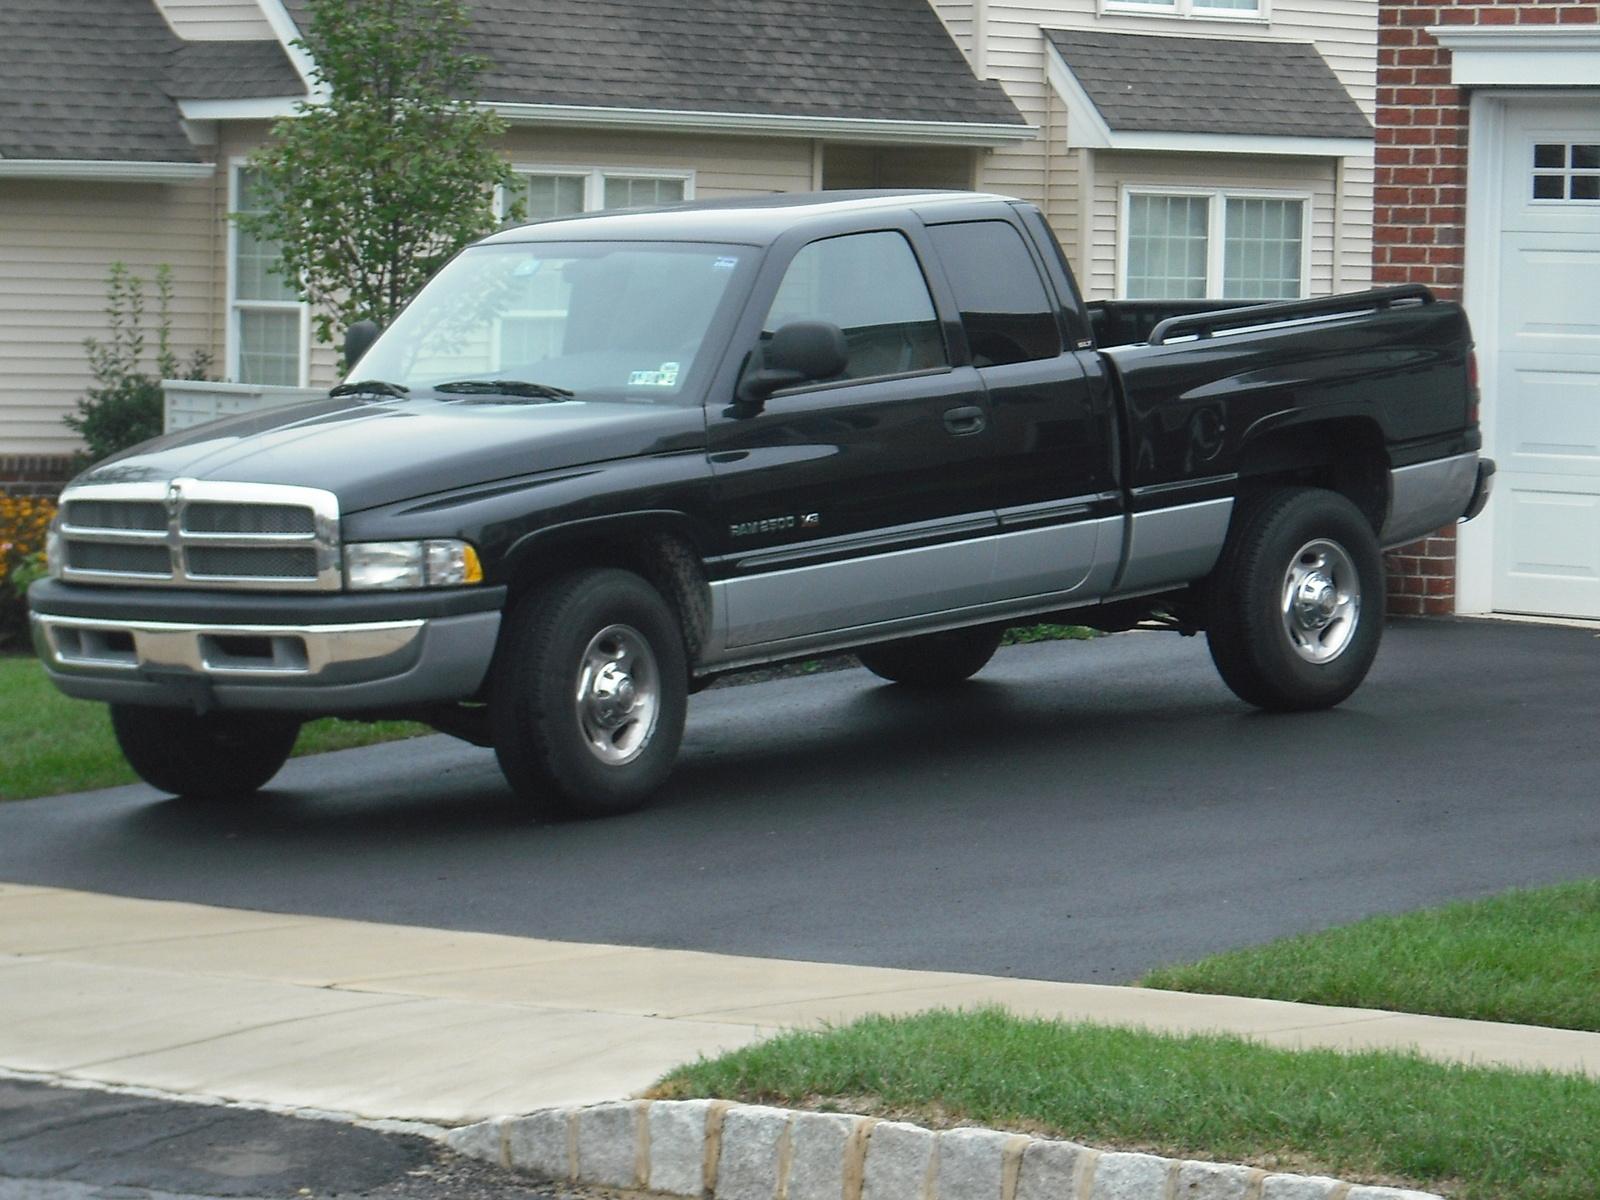 2001 dodge ram pickup 2500 pictures cargurus. Black Bedroom Furniture Sets. Home Design Ideas